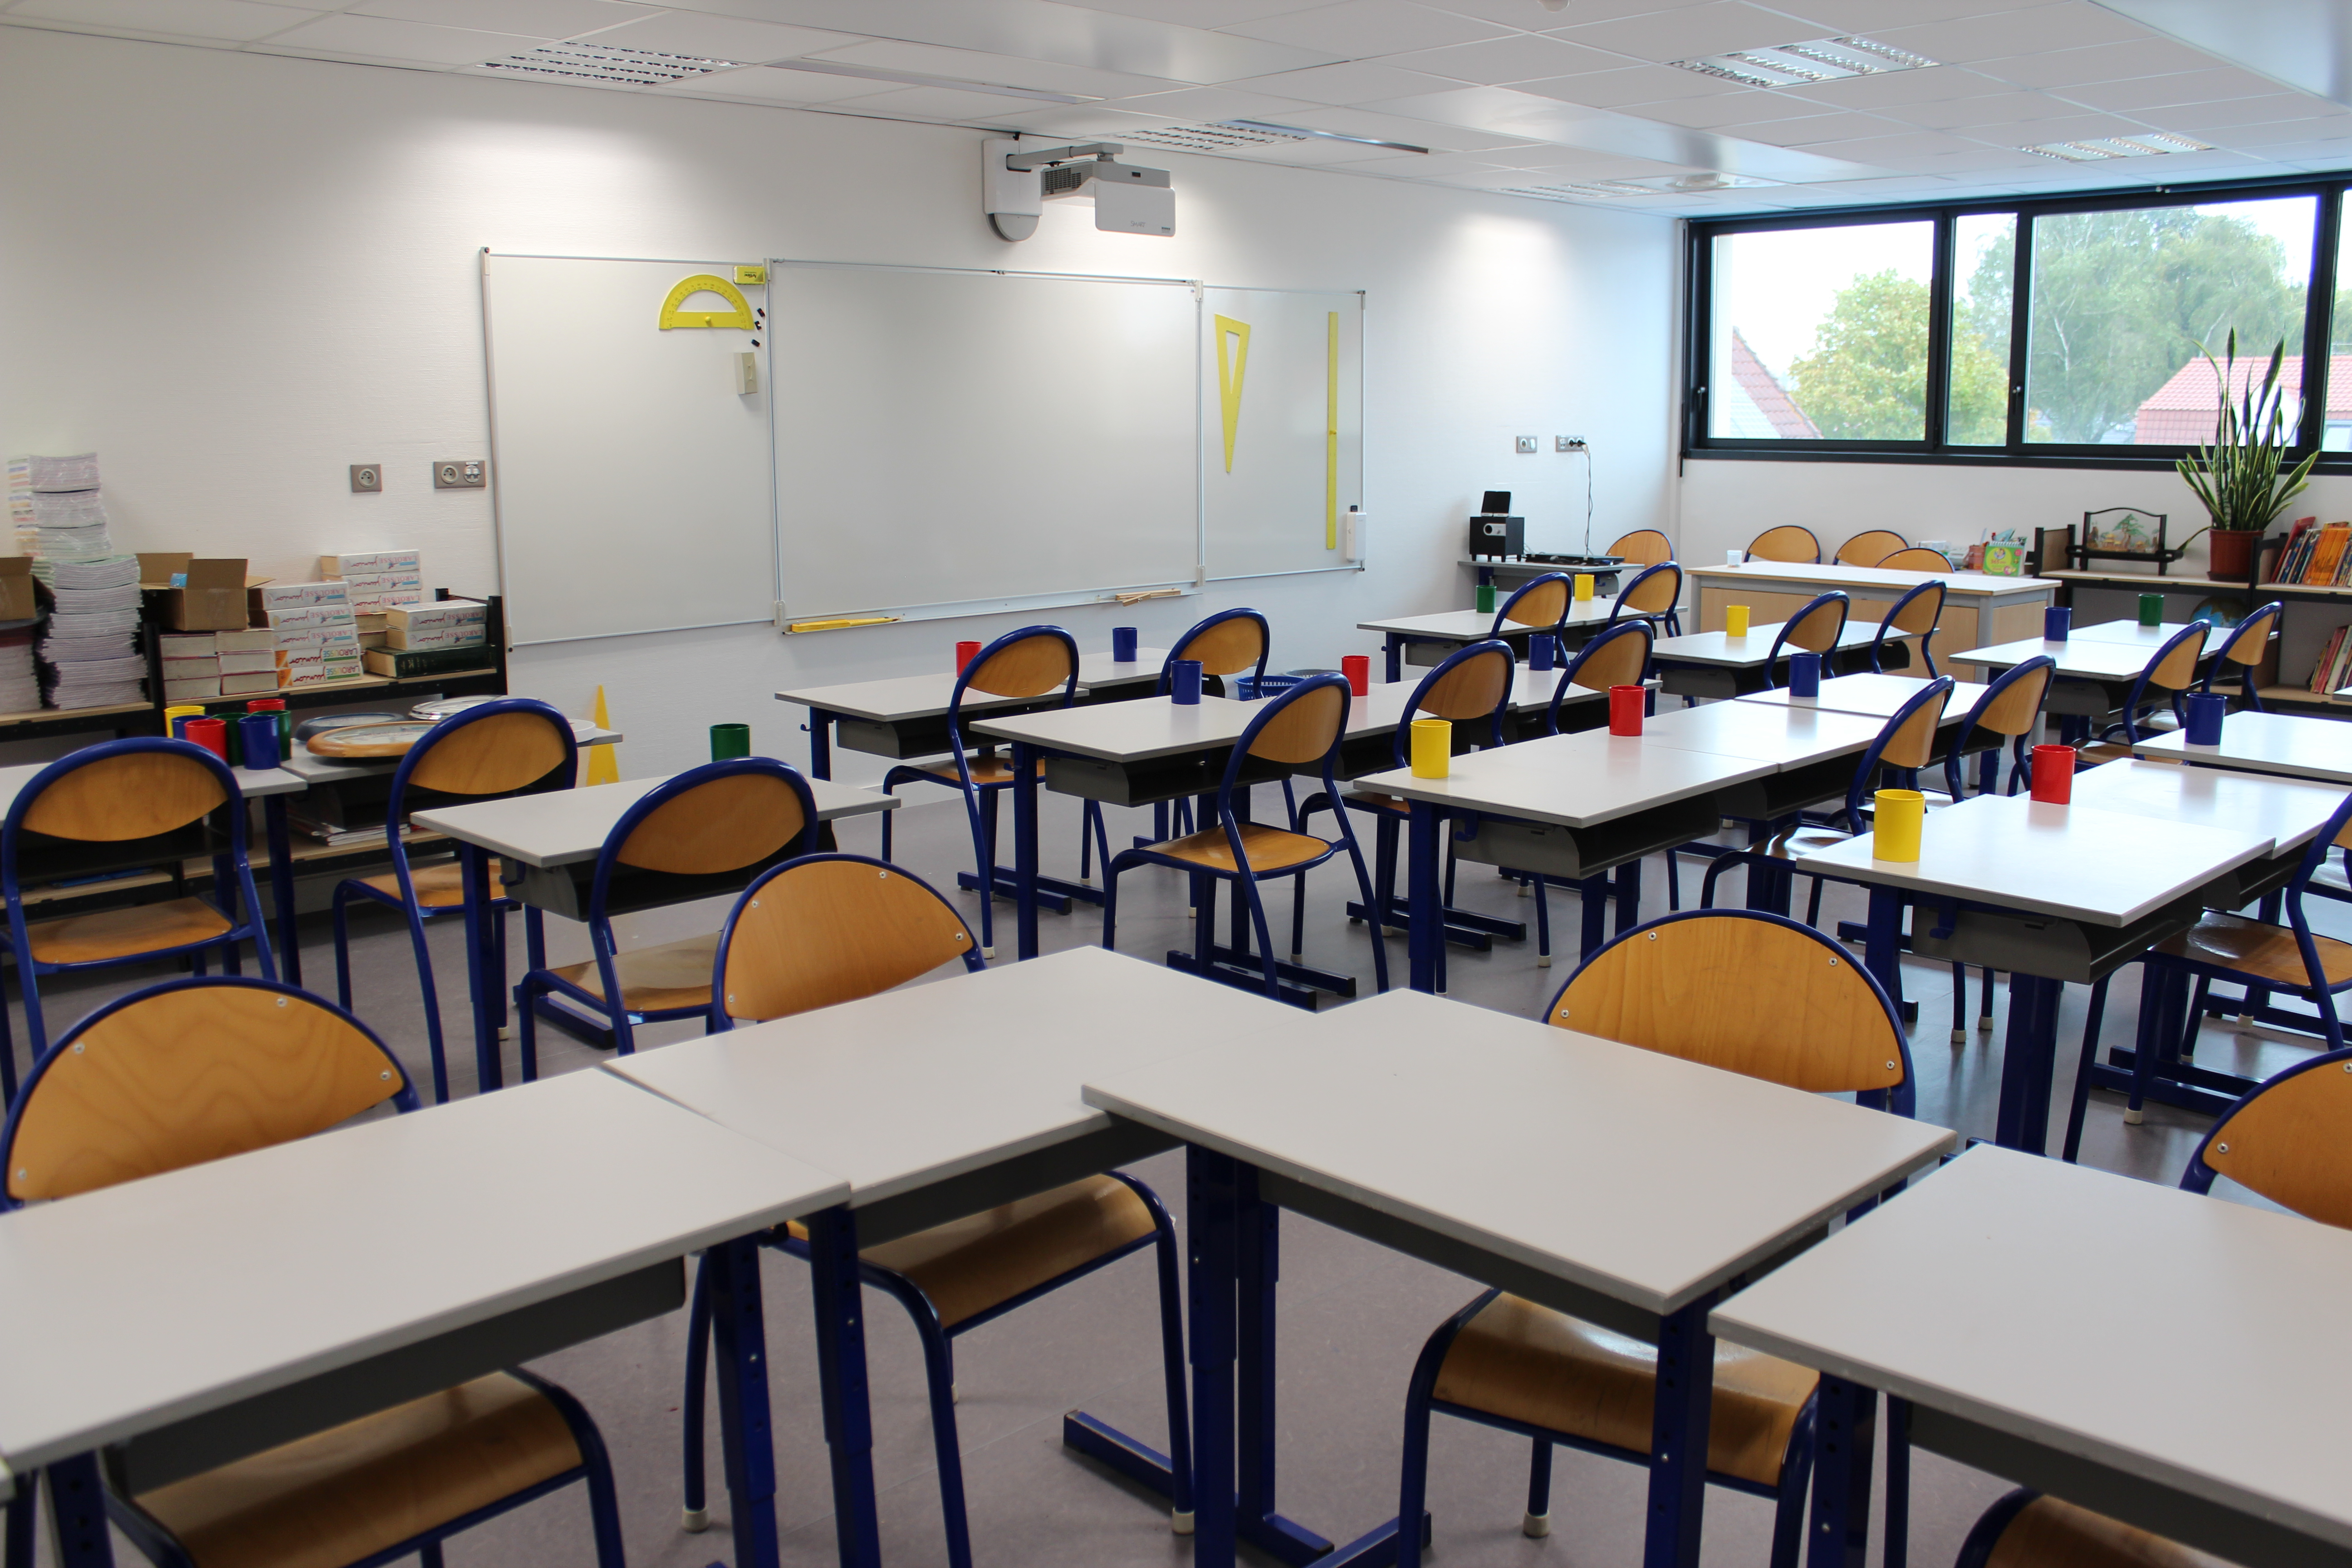 Ecole Saint Exupery